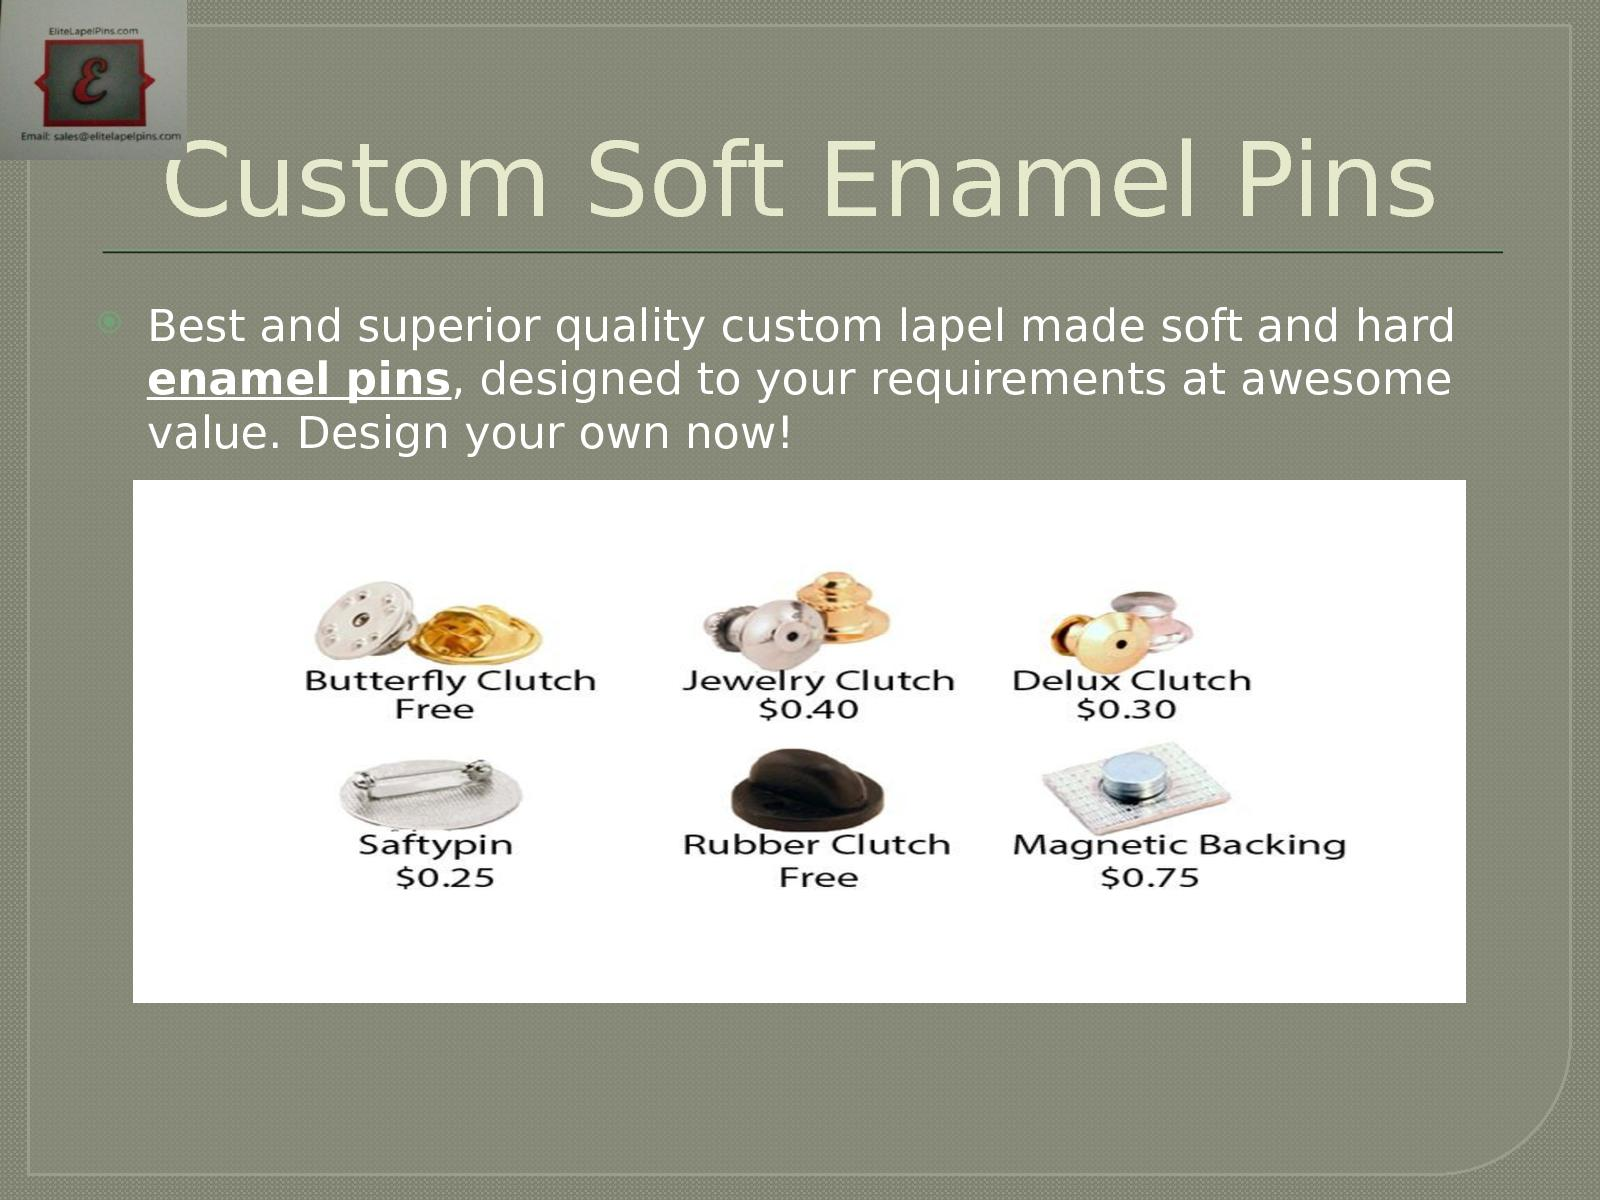 Calaméo - Custom Soft Enamel Pins